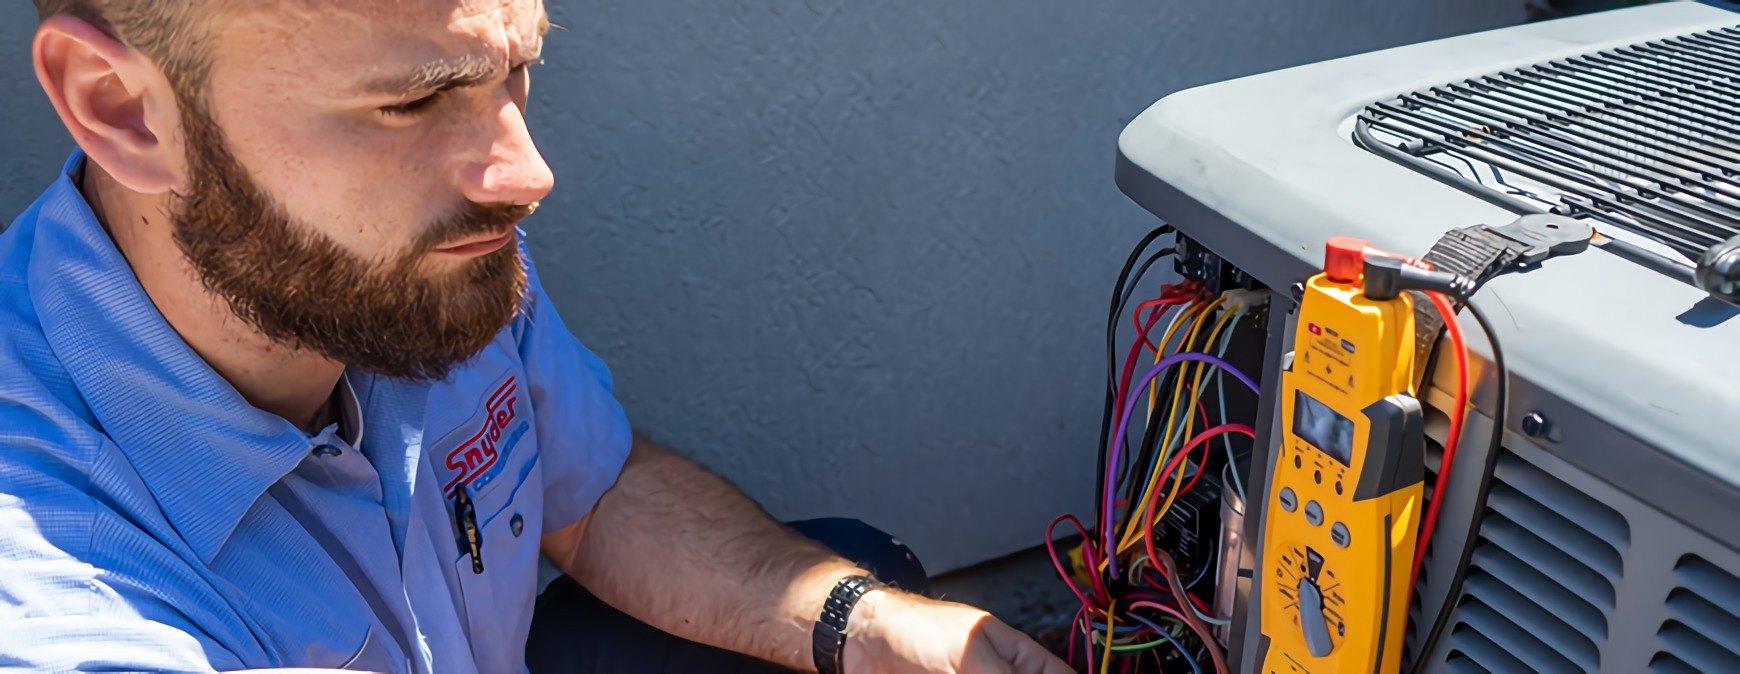 hvac technician working on outside unit